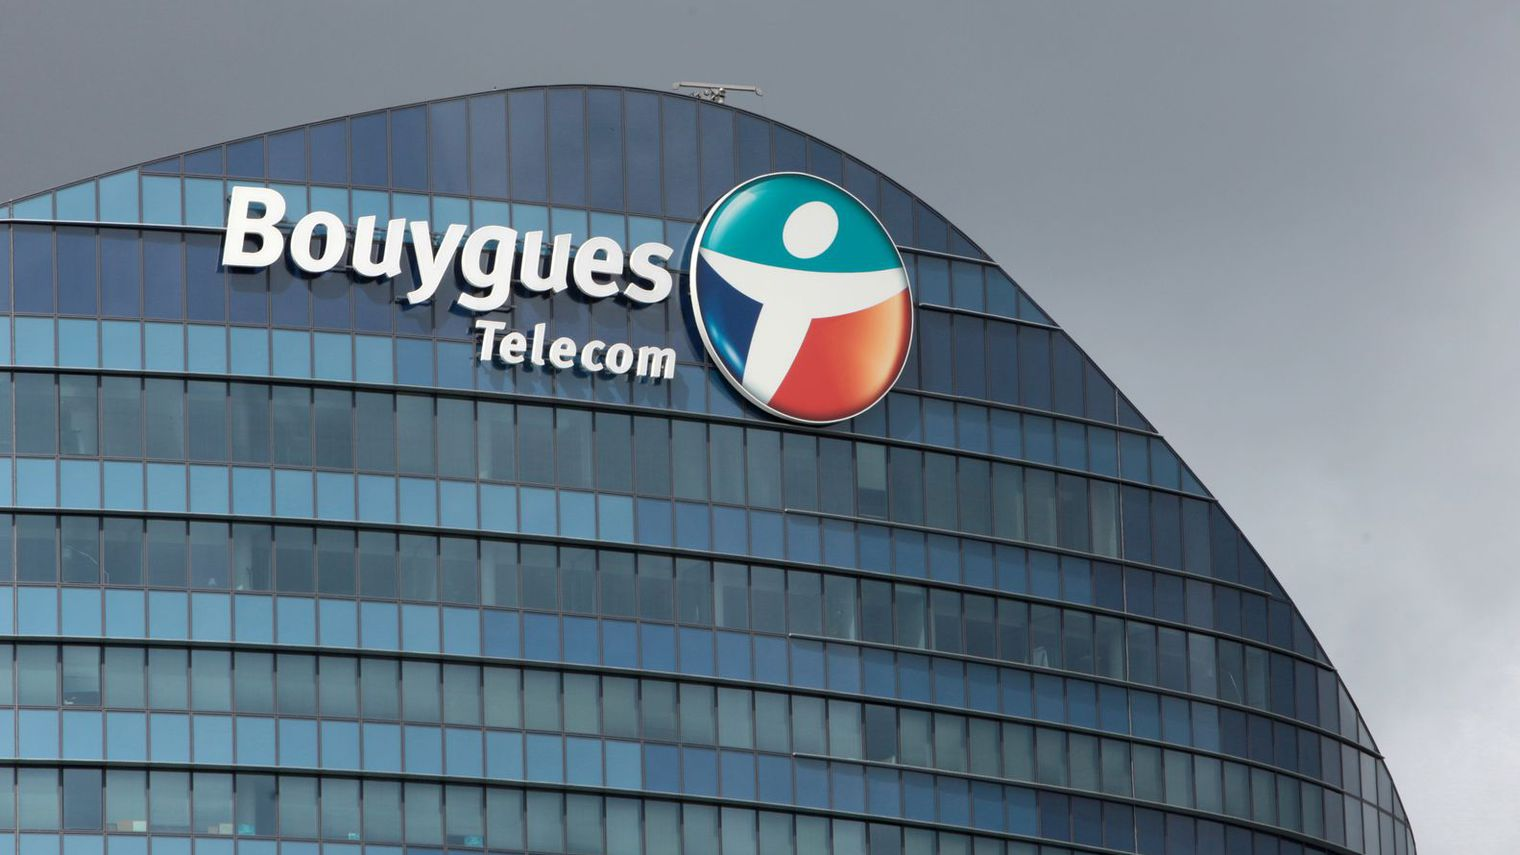 imagesbouygues-telecom-10.jpg